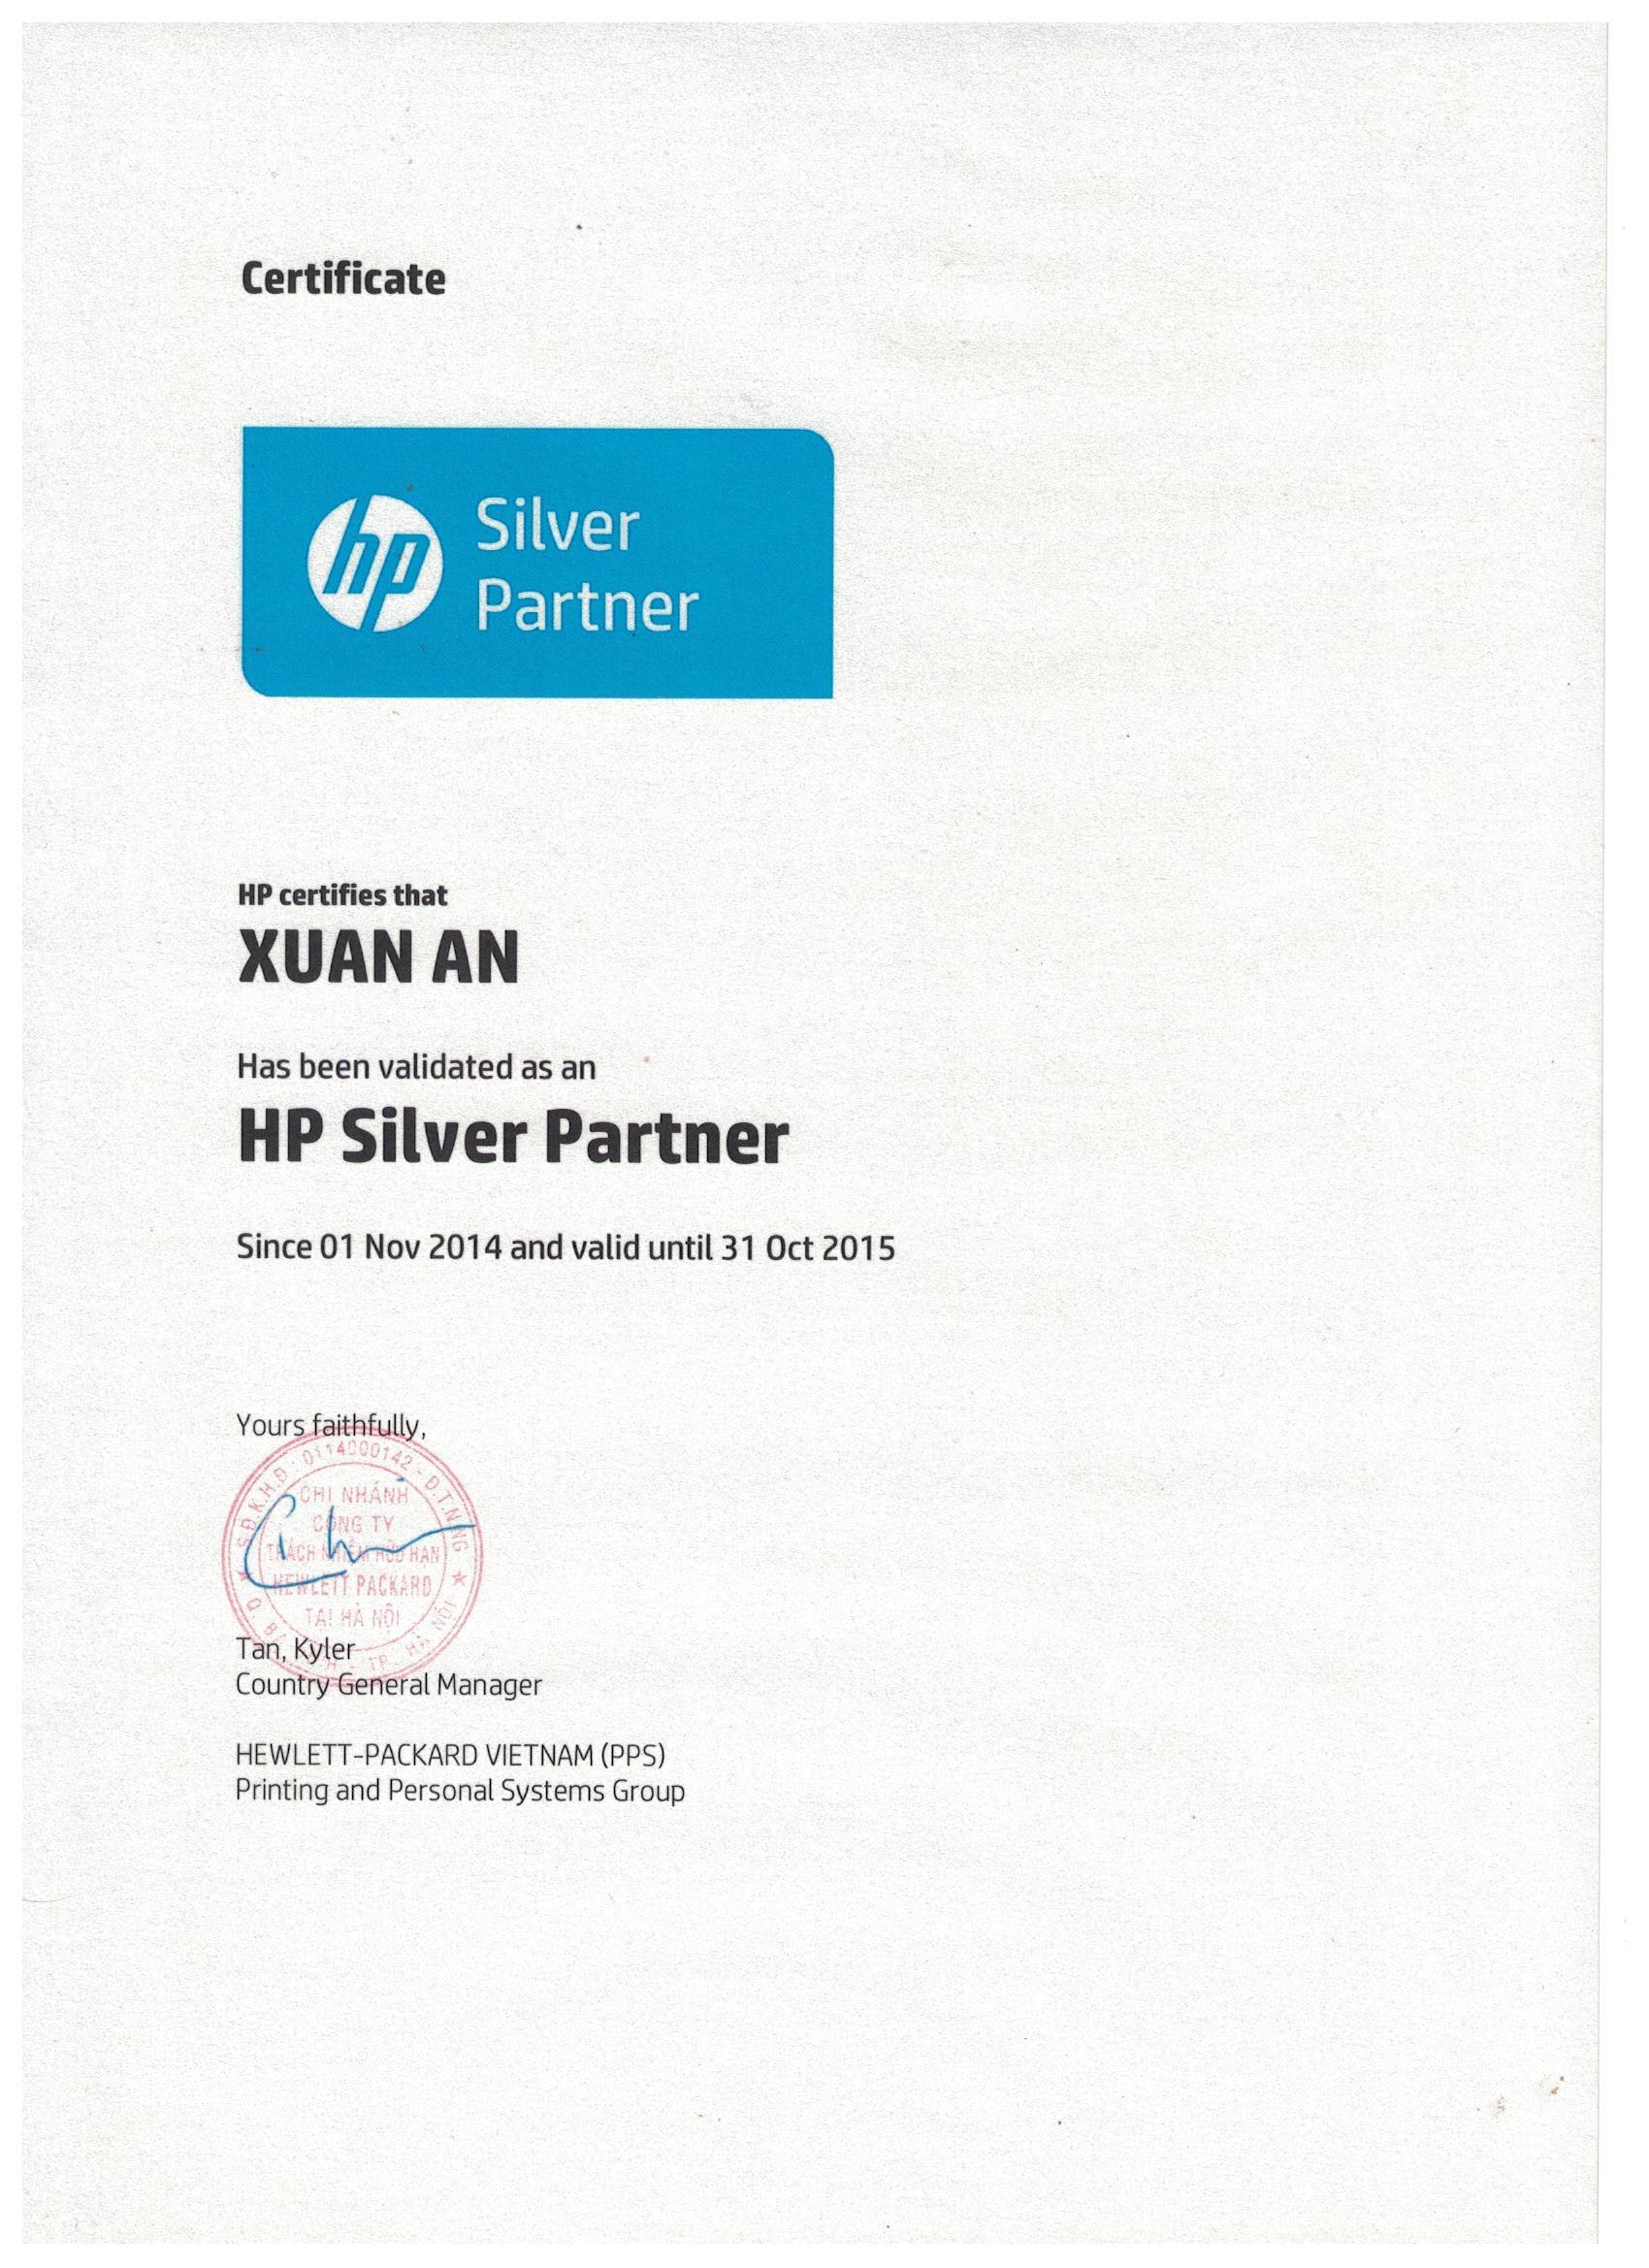 HP Probook 430 G7 - 9GQ01PA (Silver)